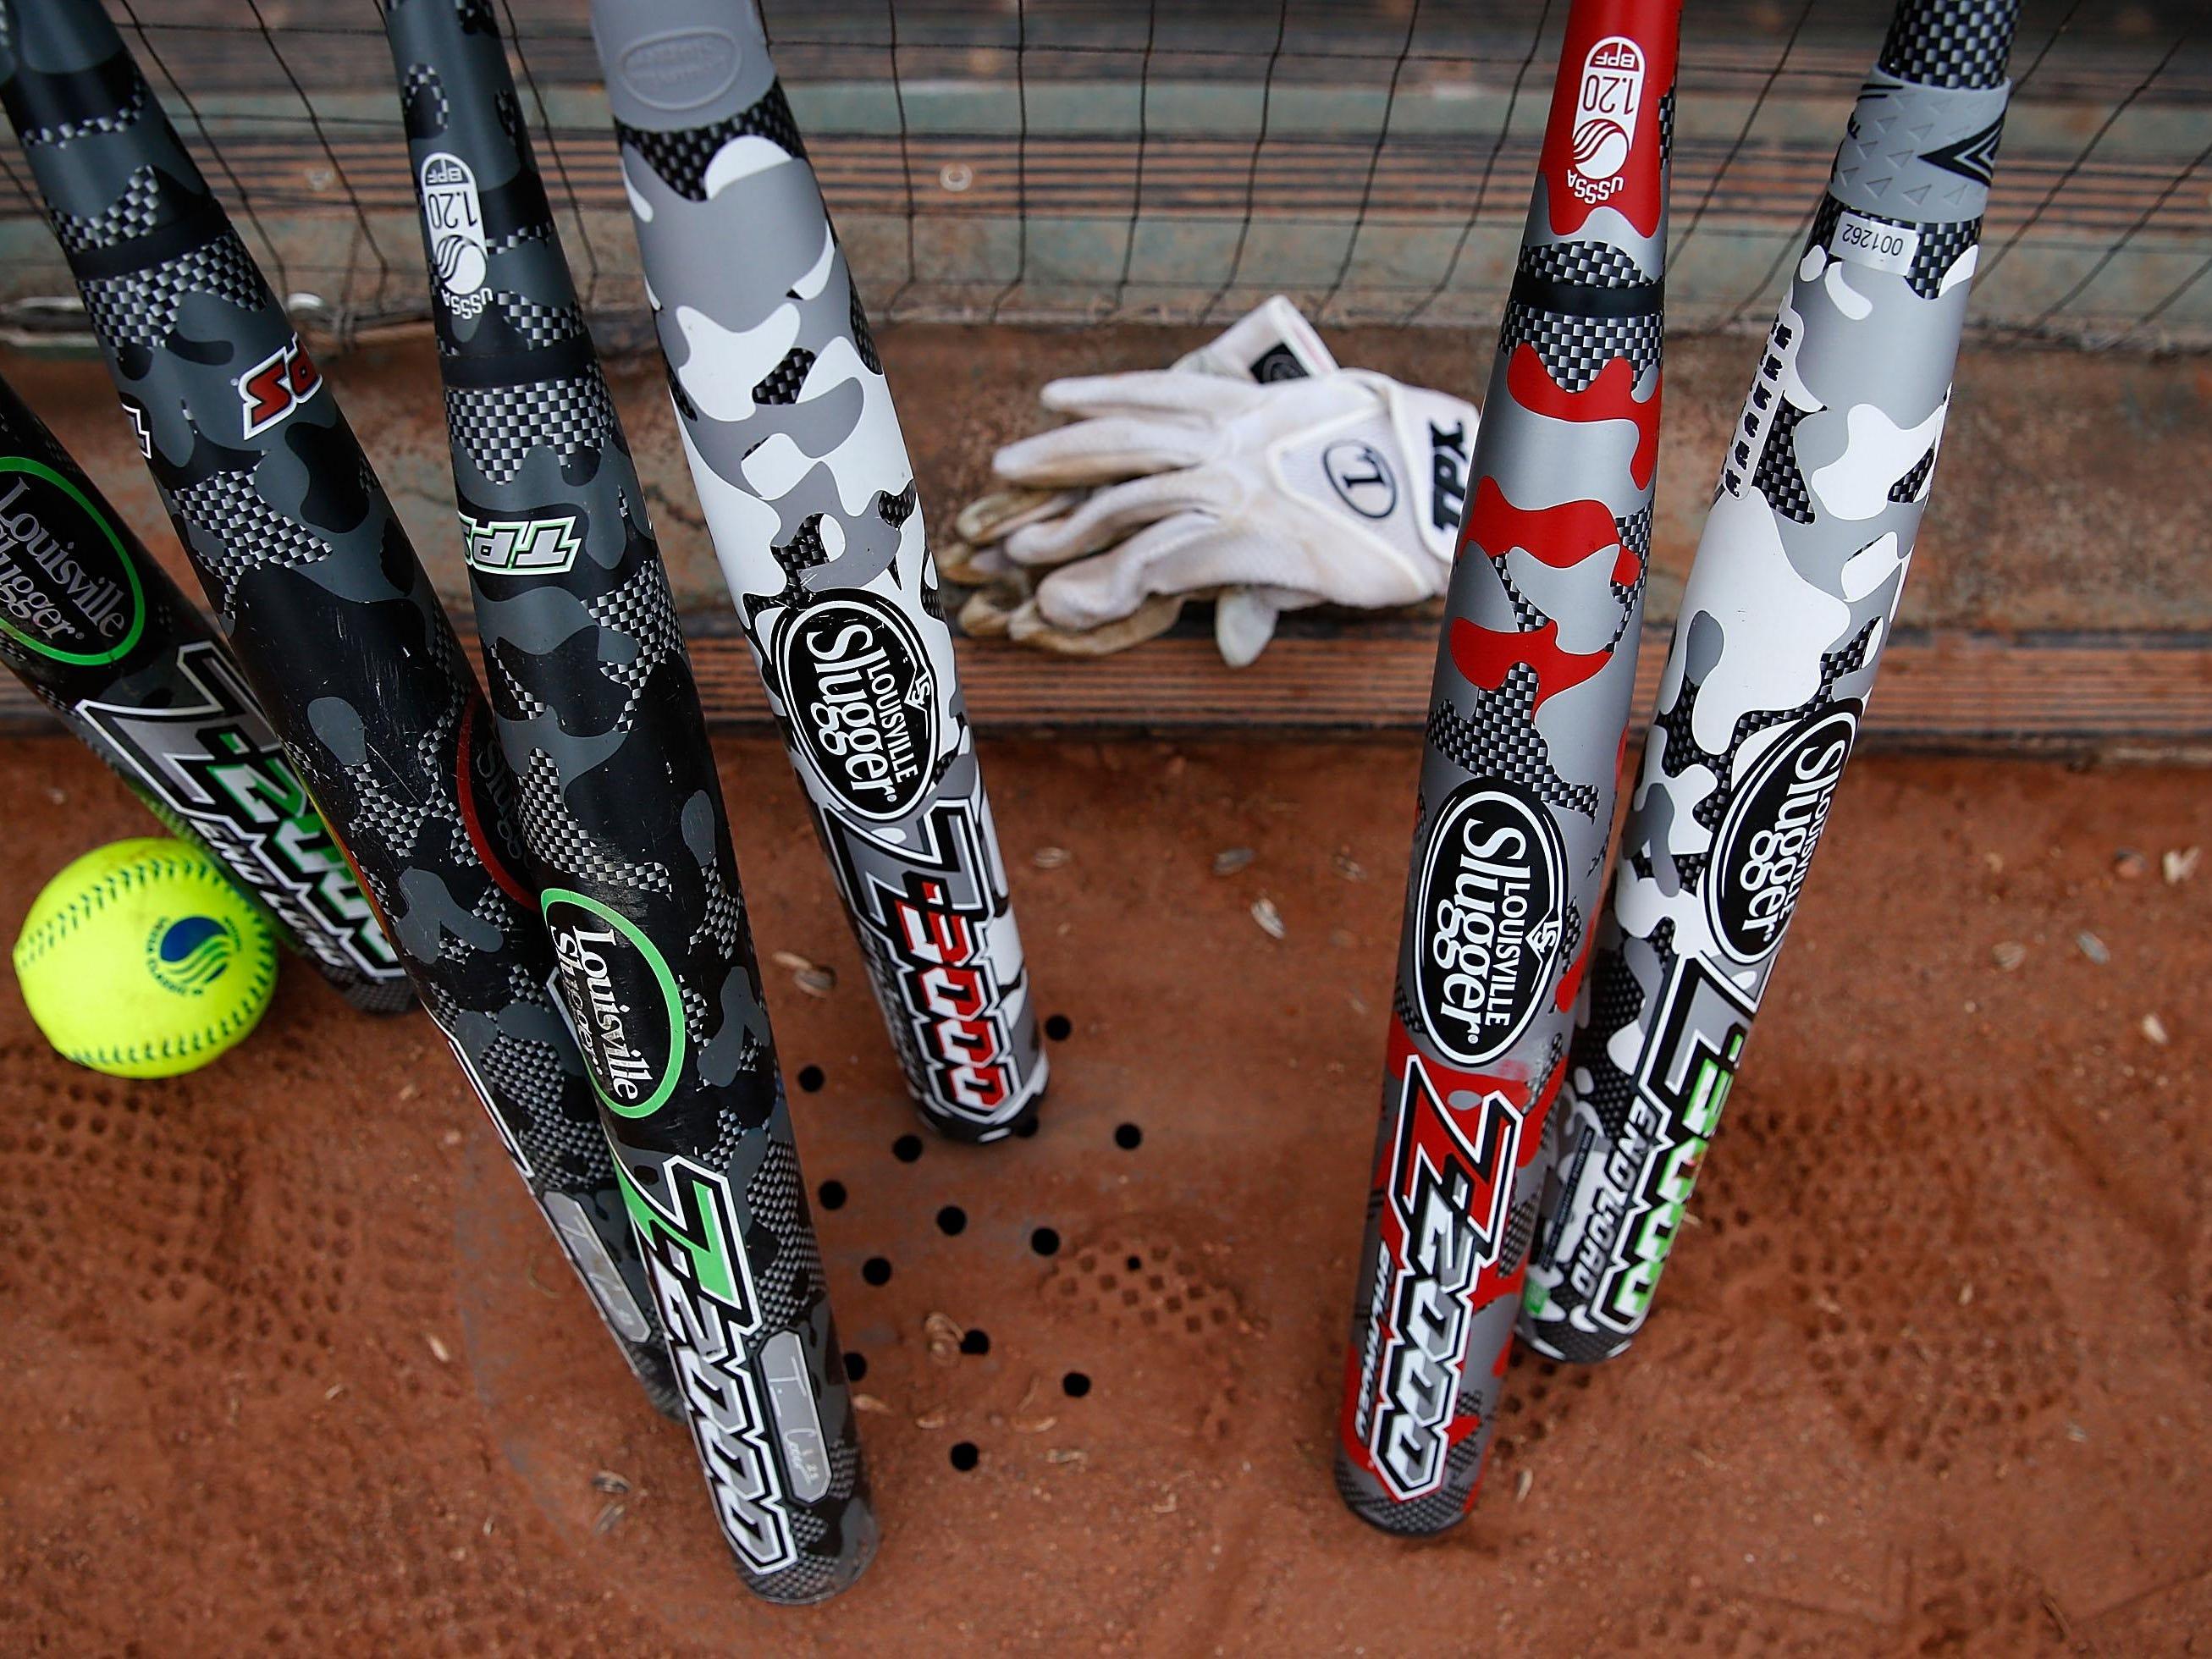 Baseball, softball winding down regular seasons.